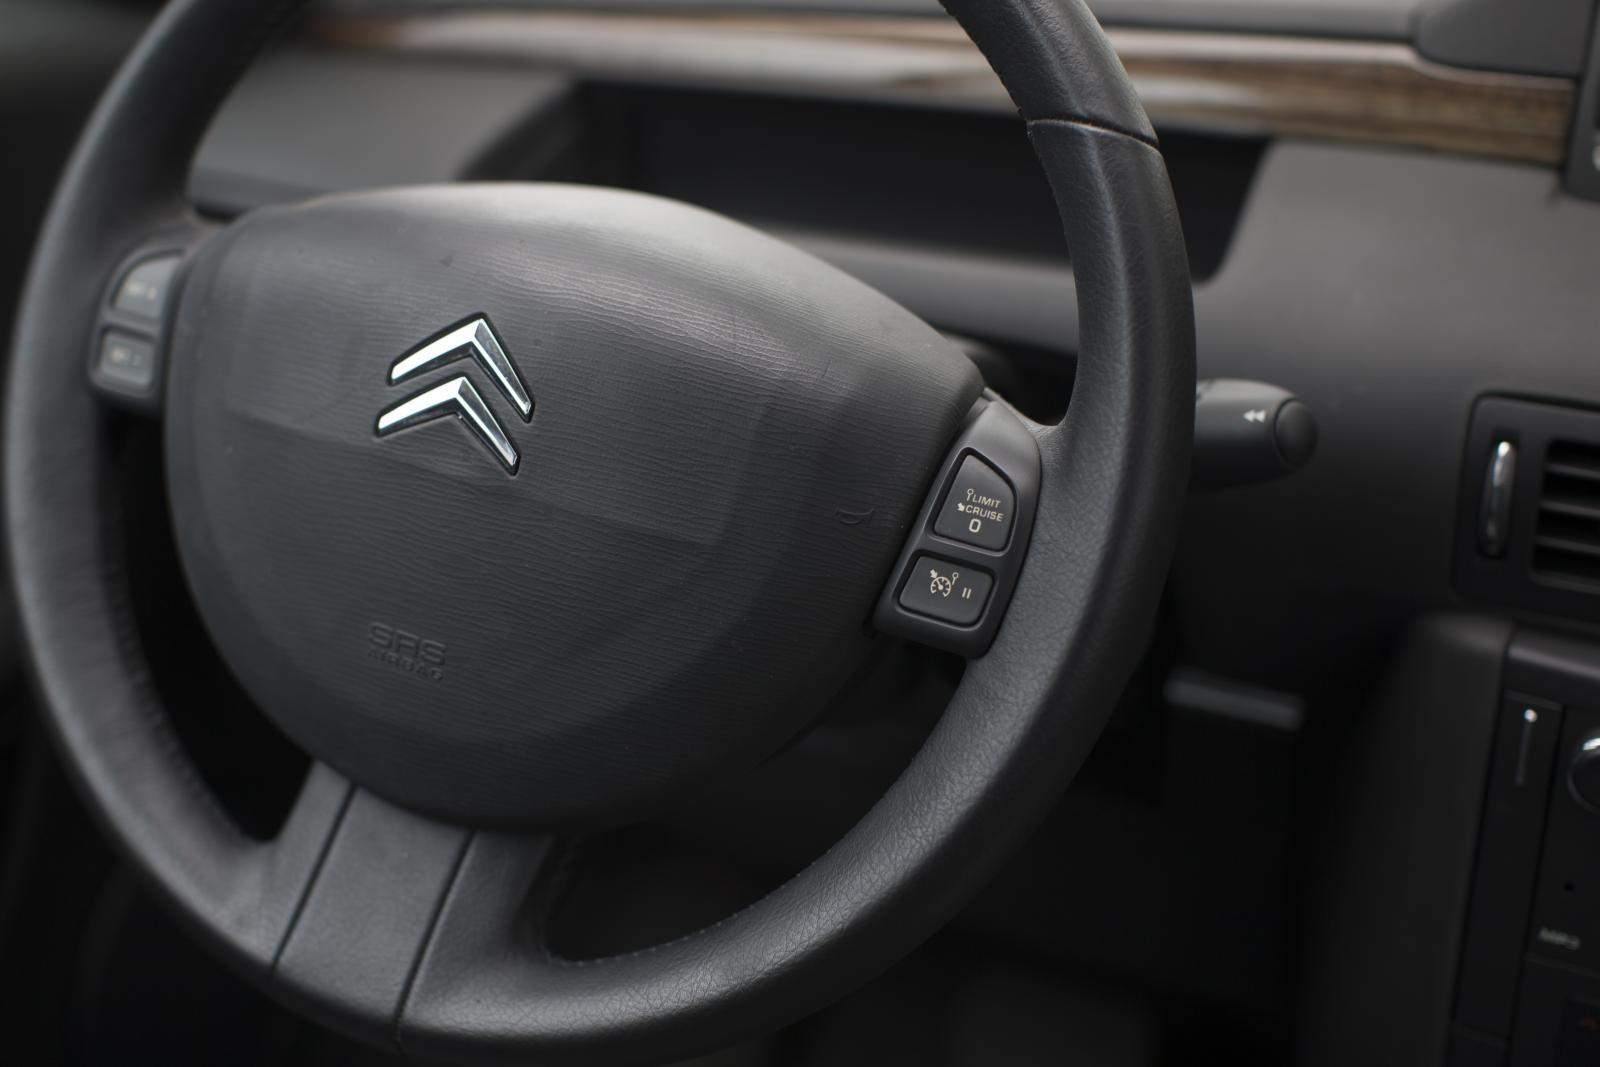 C6 του 2005, τιμόνι